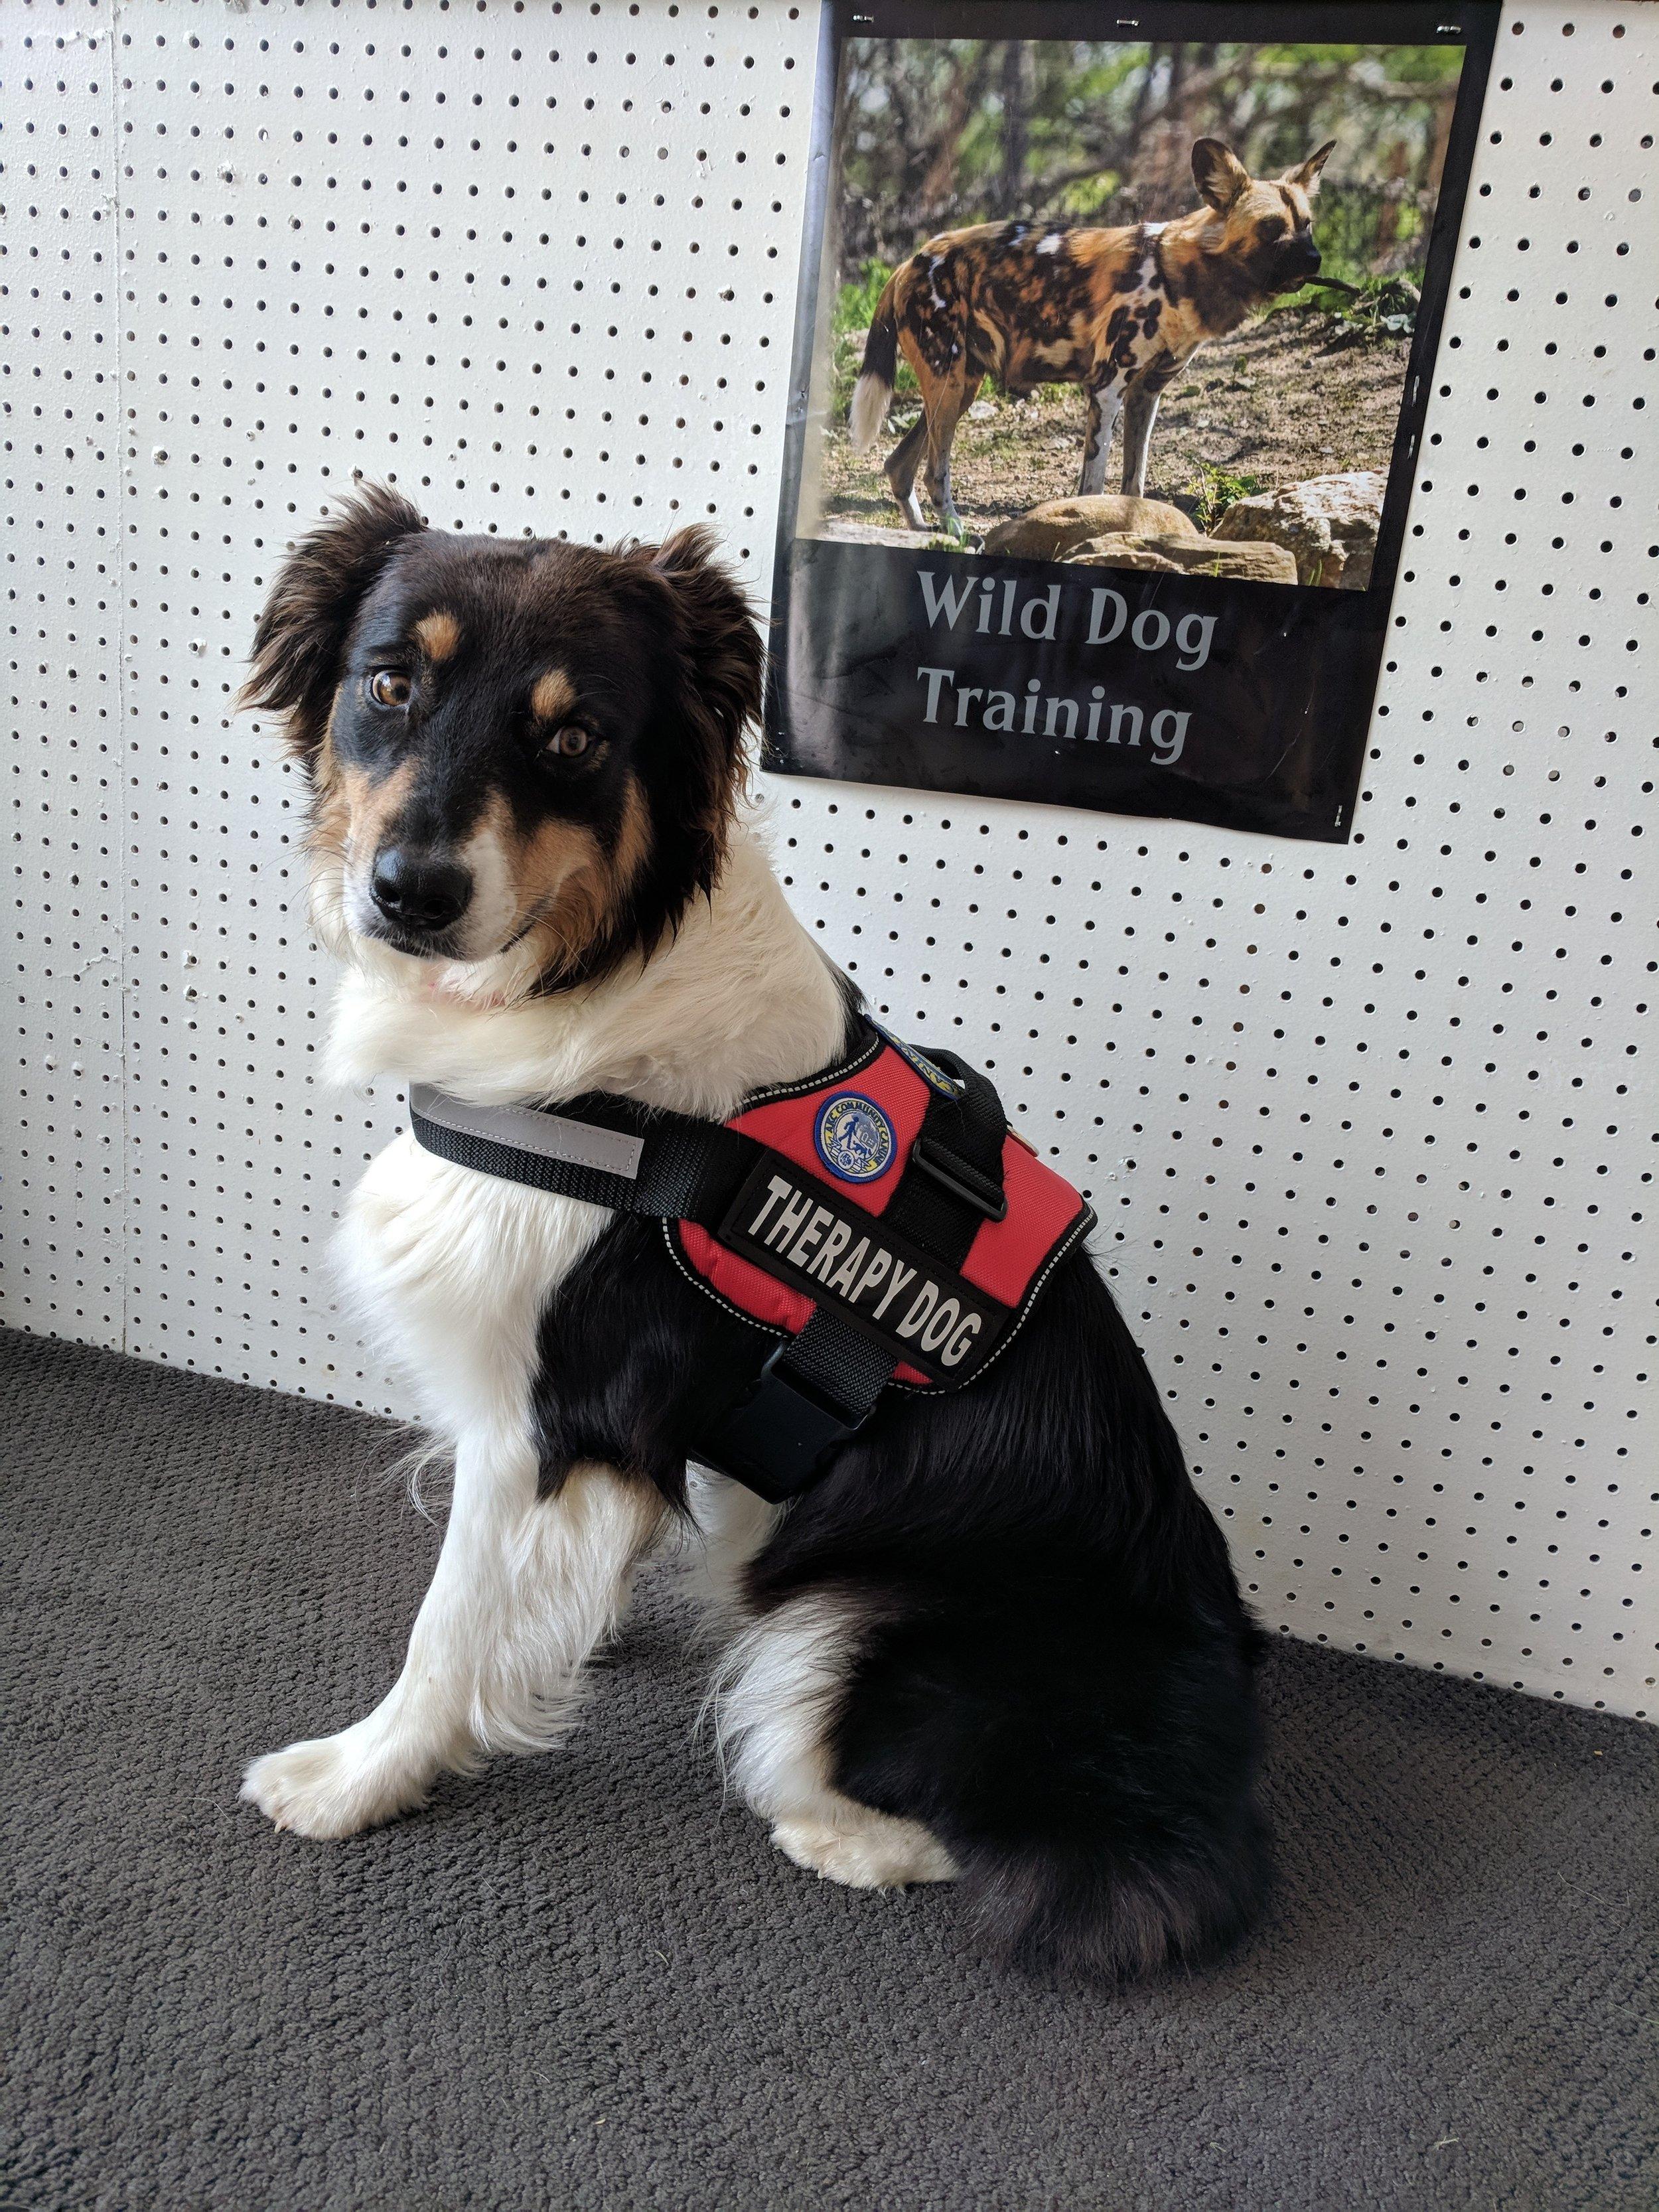 wilddogtherapy3.jpg